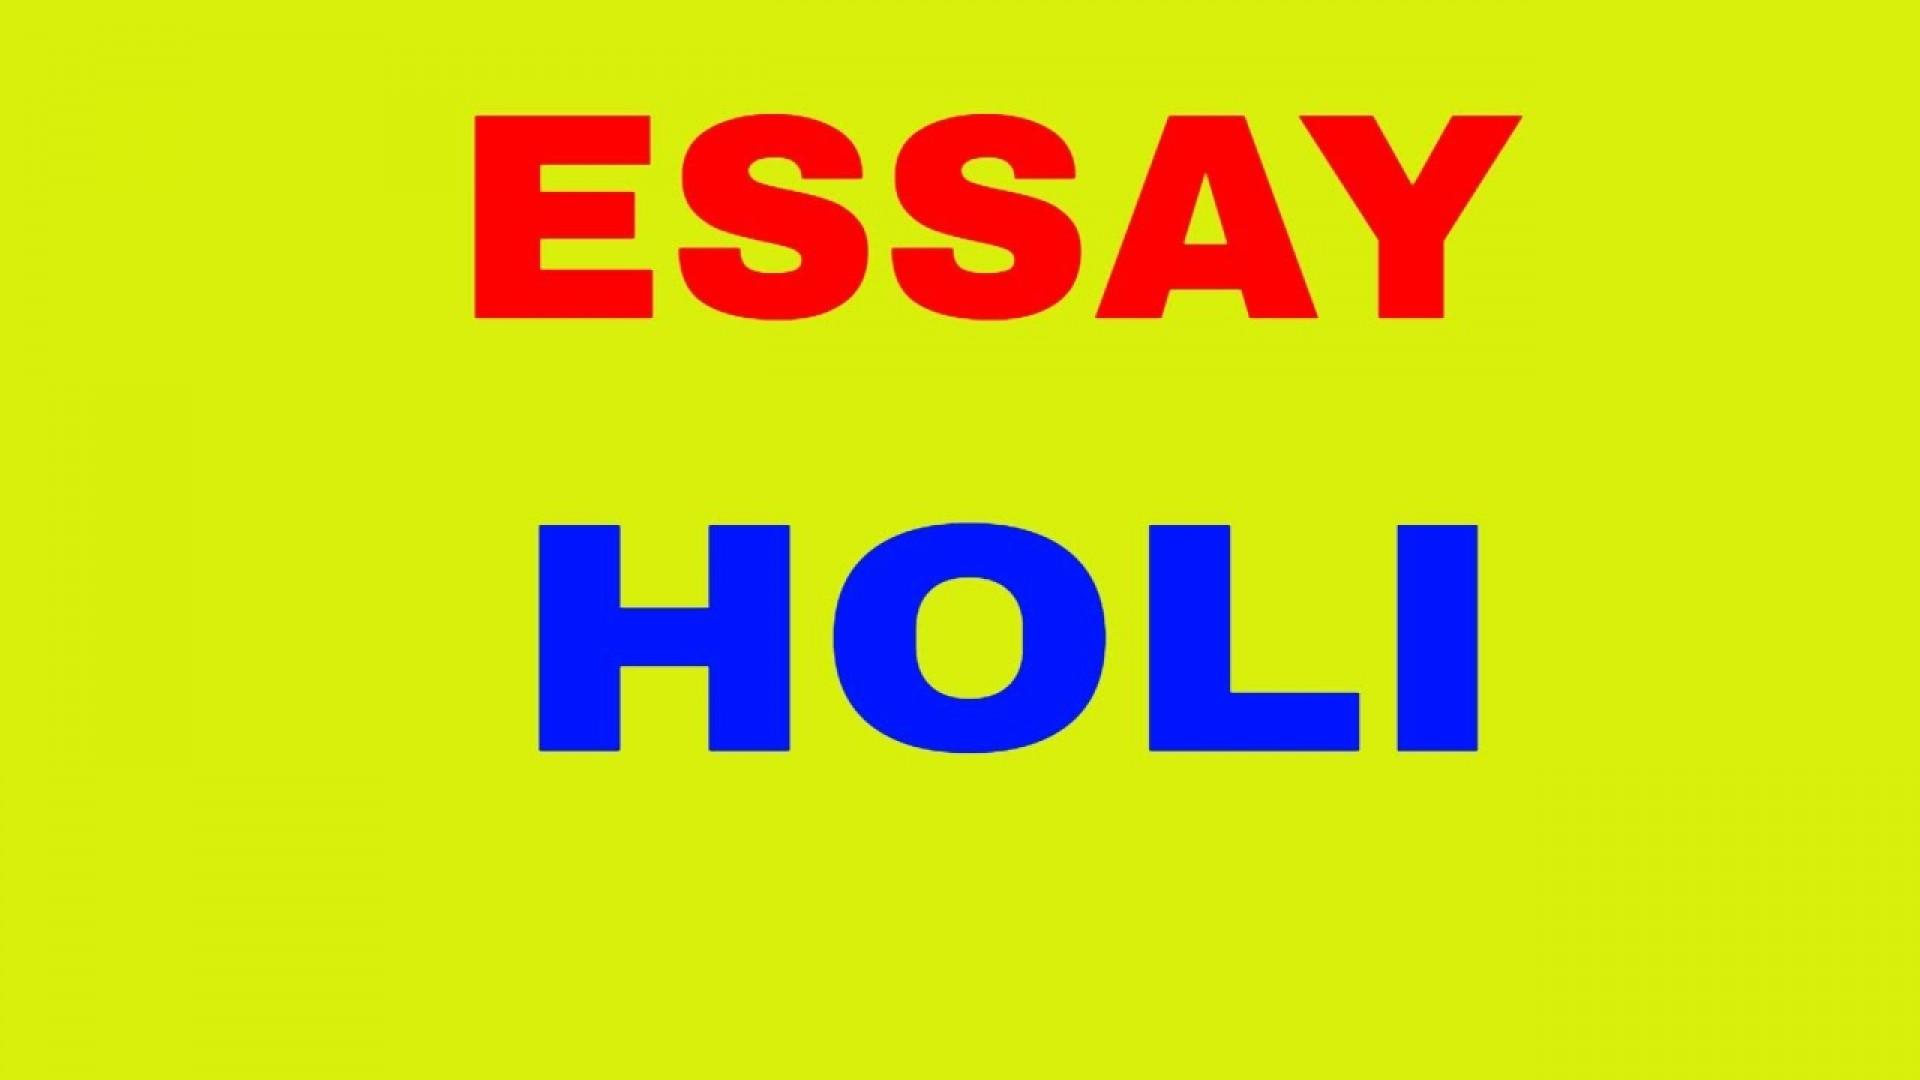 012 Essay Example Maxresdefault Holi Top Festival In Punjabi 1920